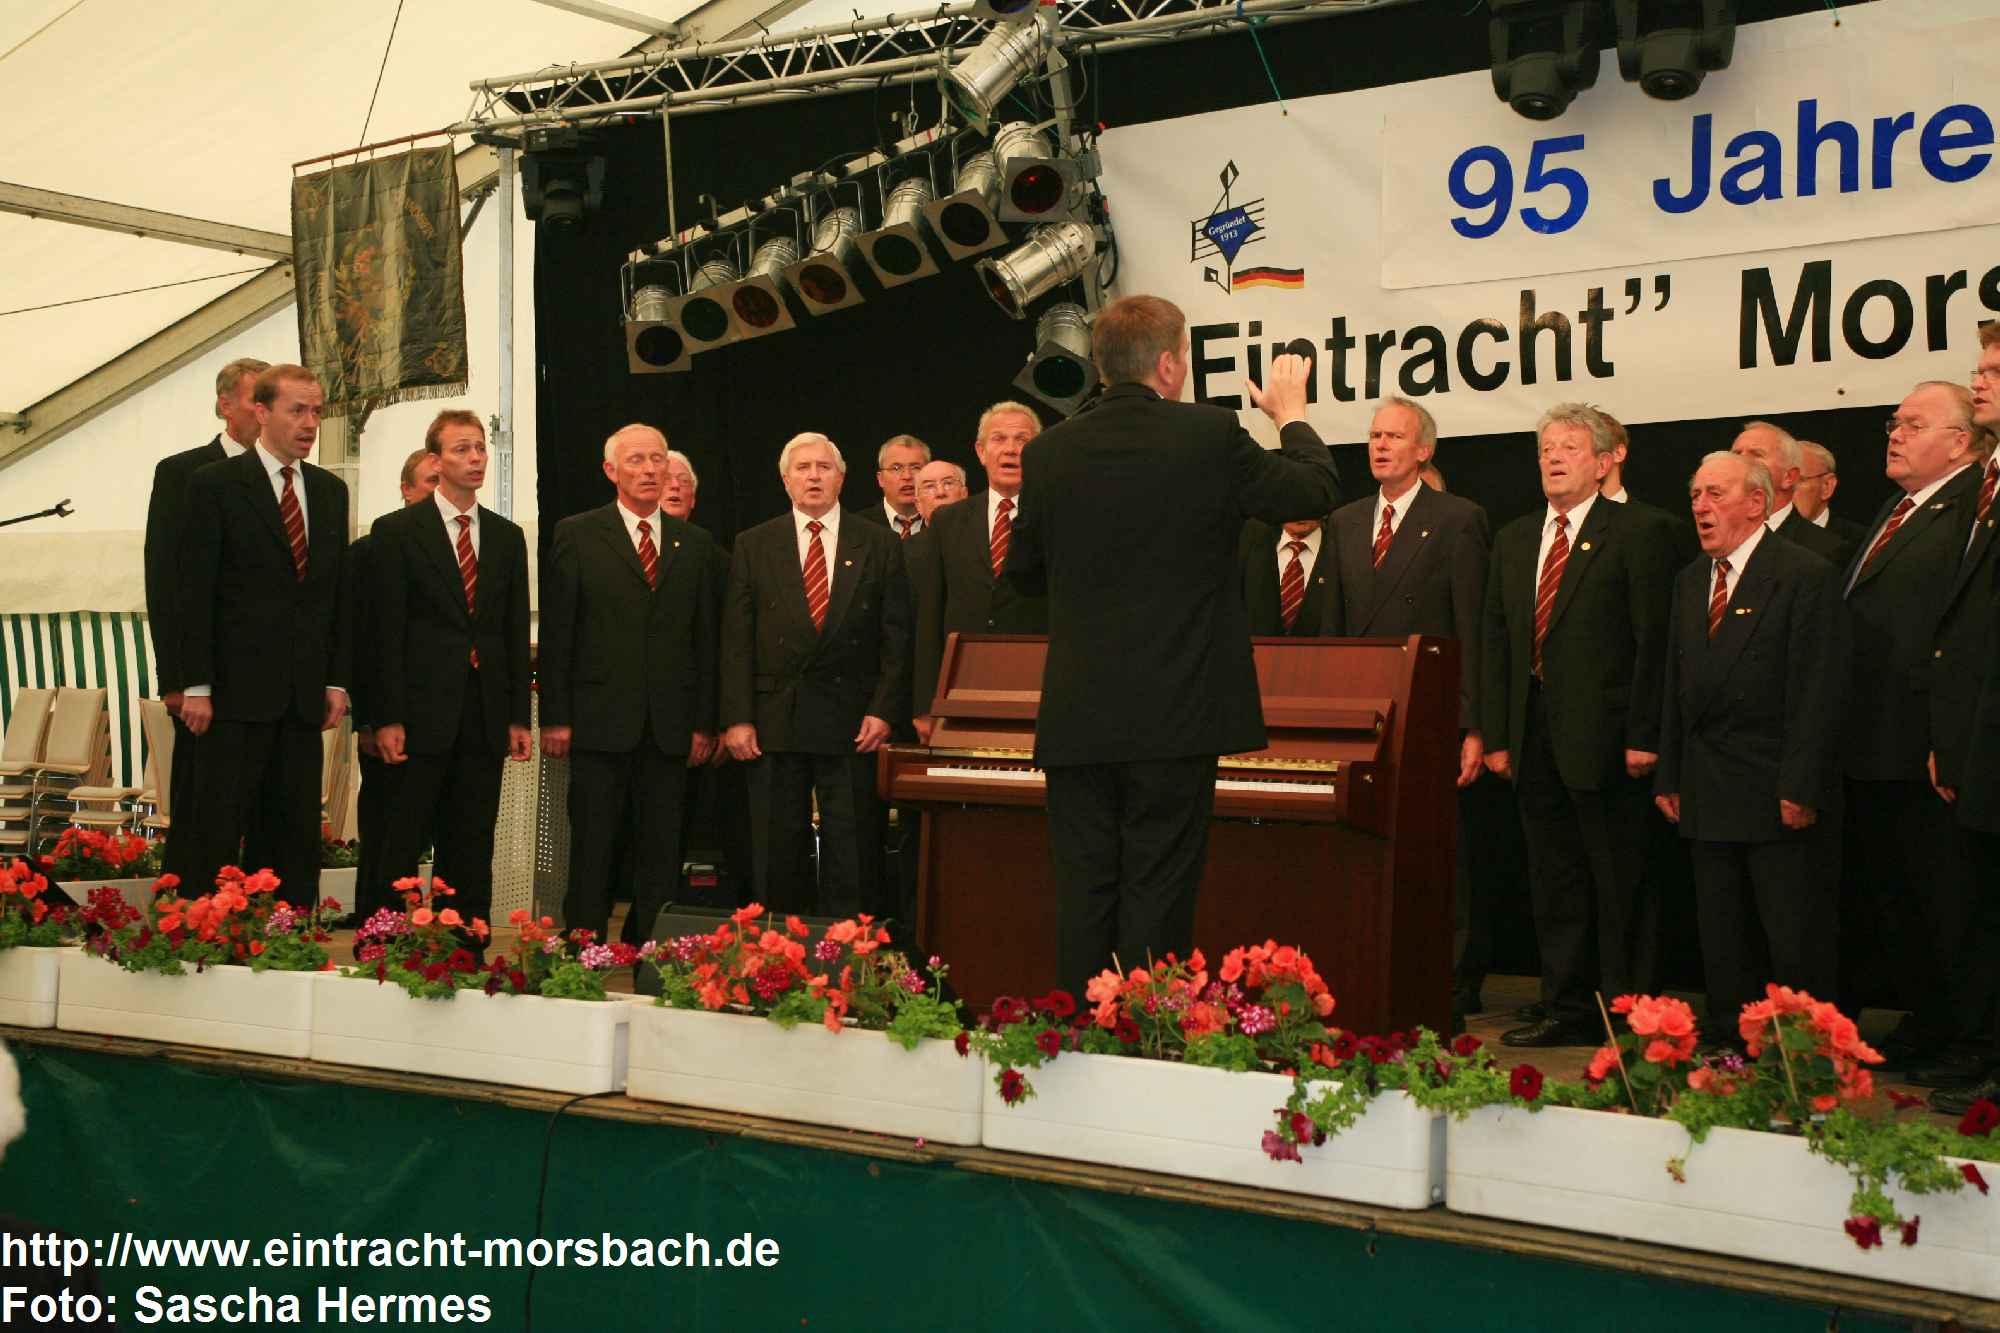 95-jahriges-jubilaum-228